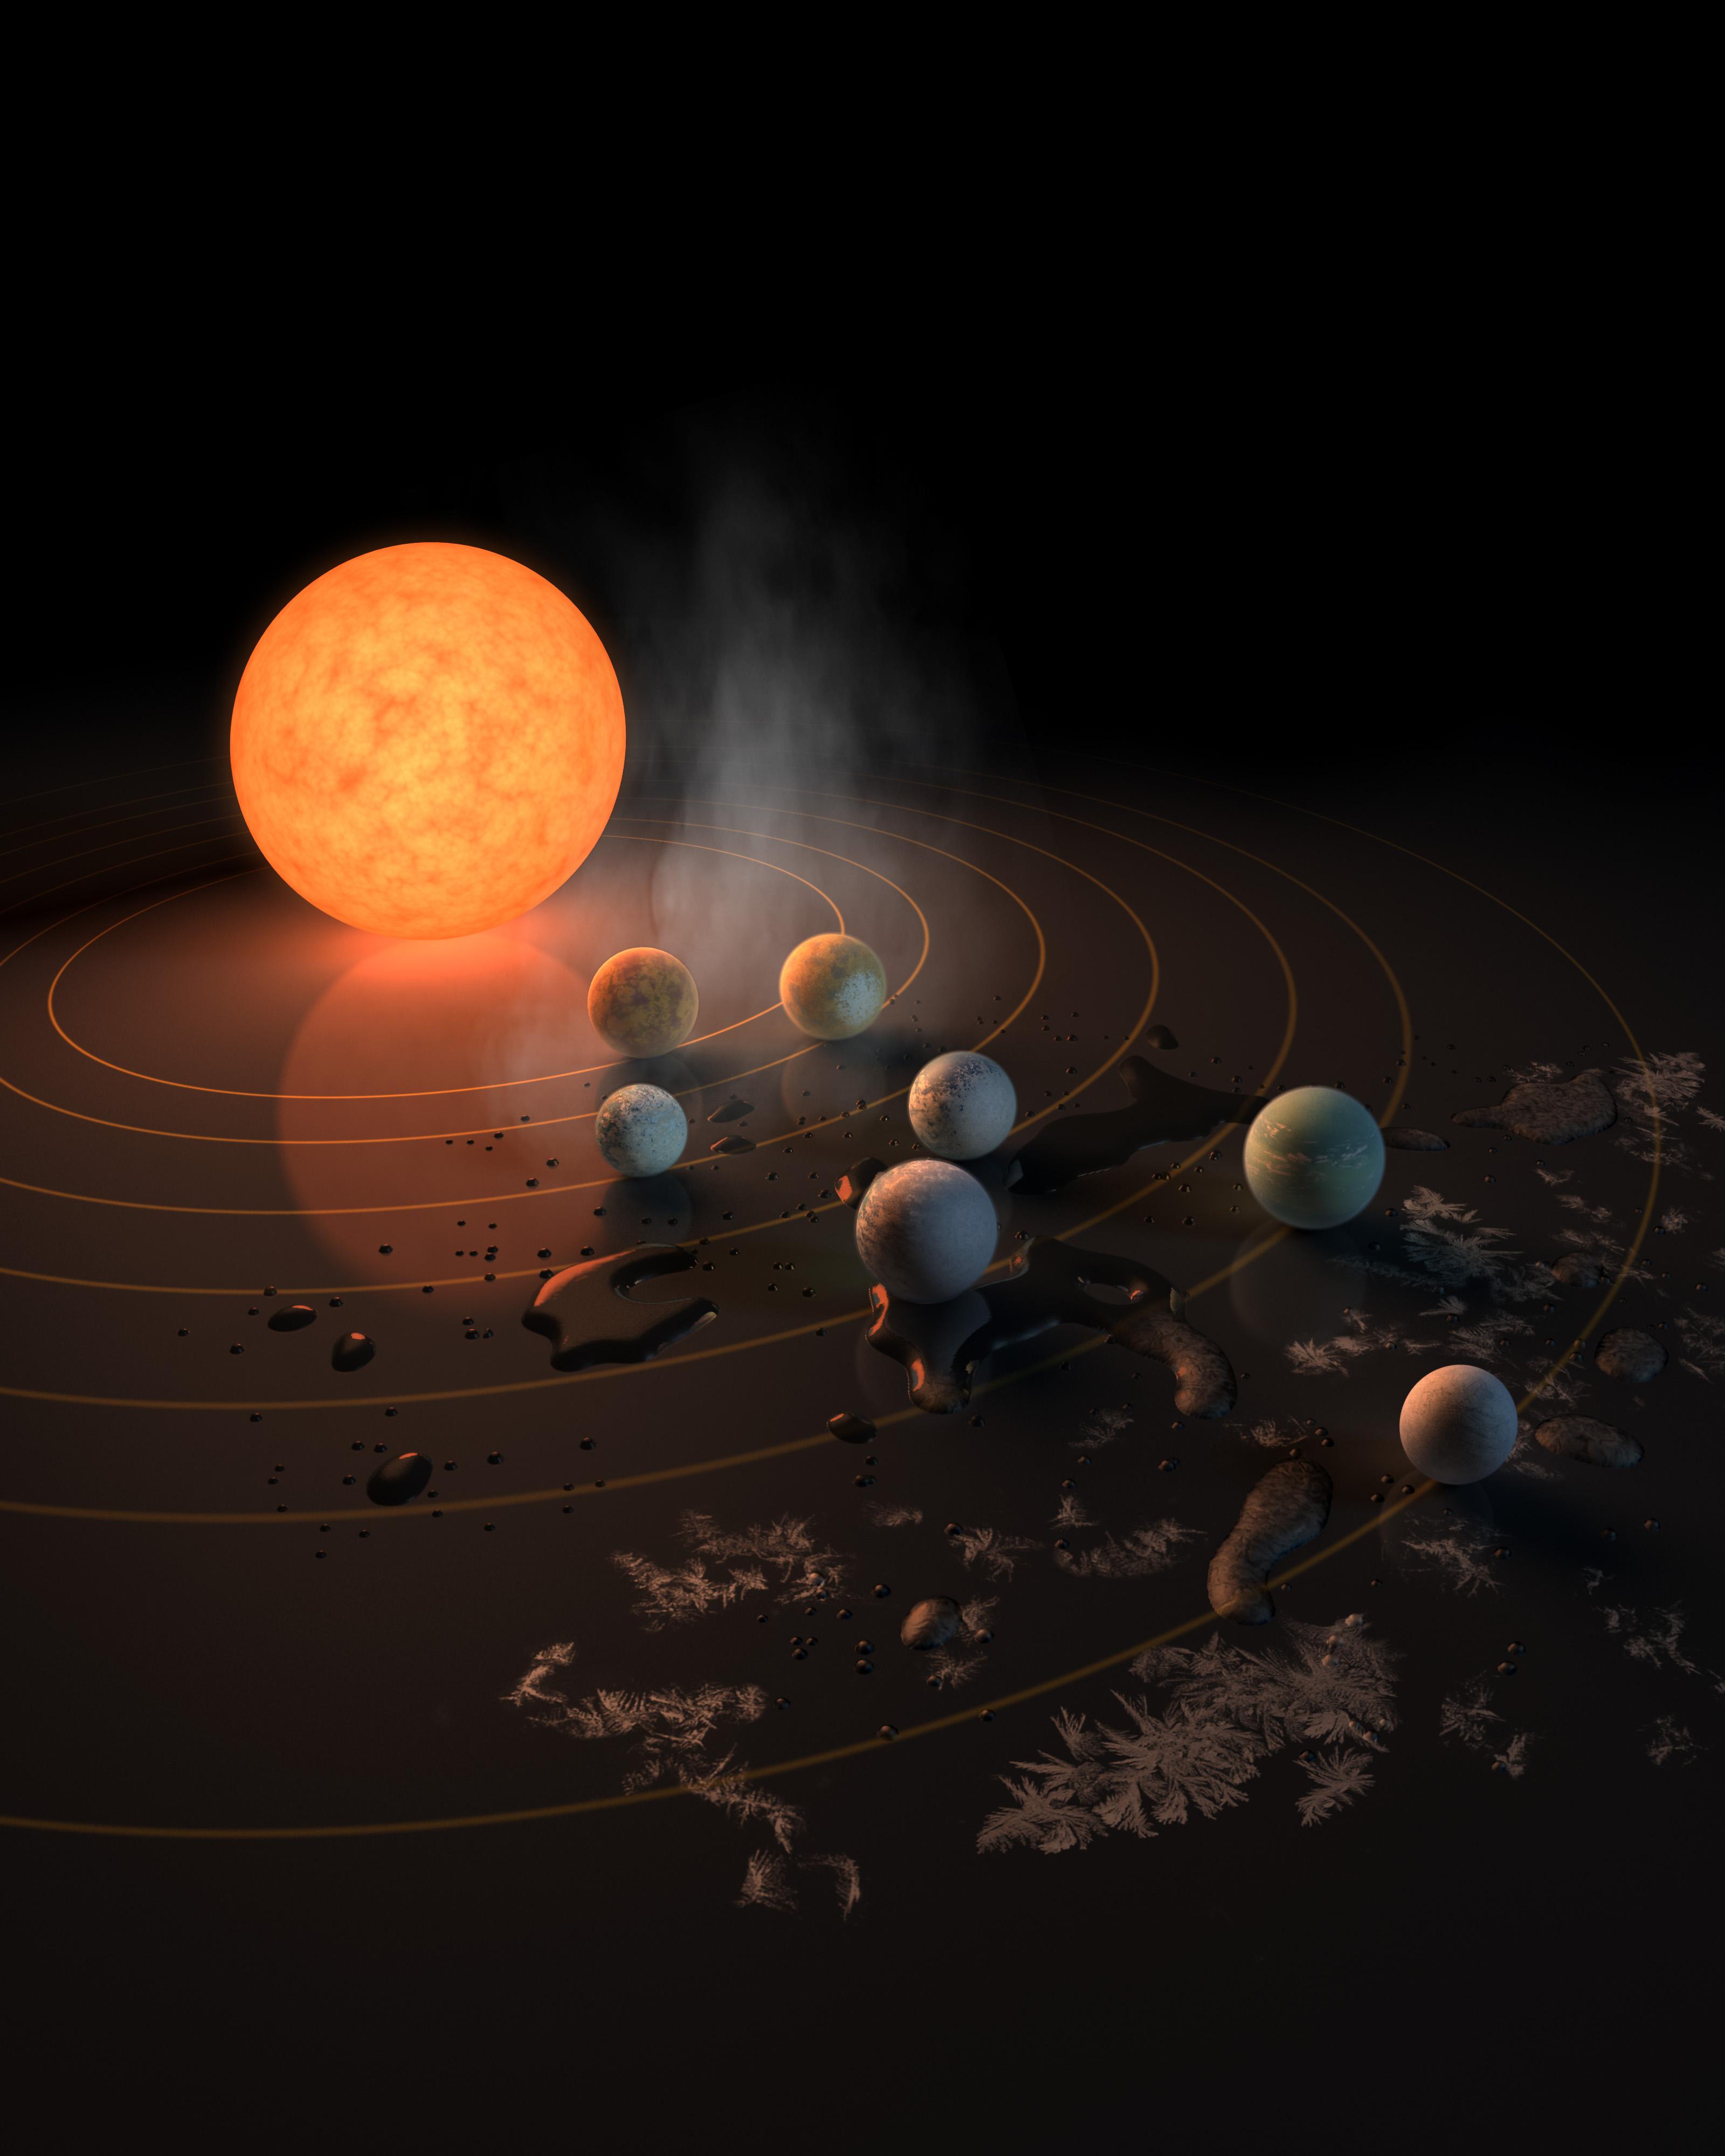 NASA Trappist 1 exoplanets